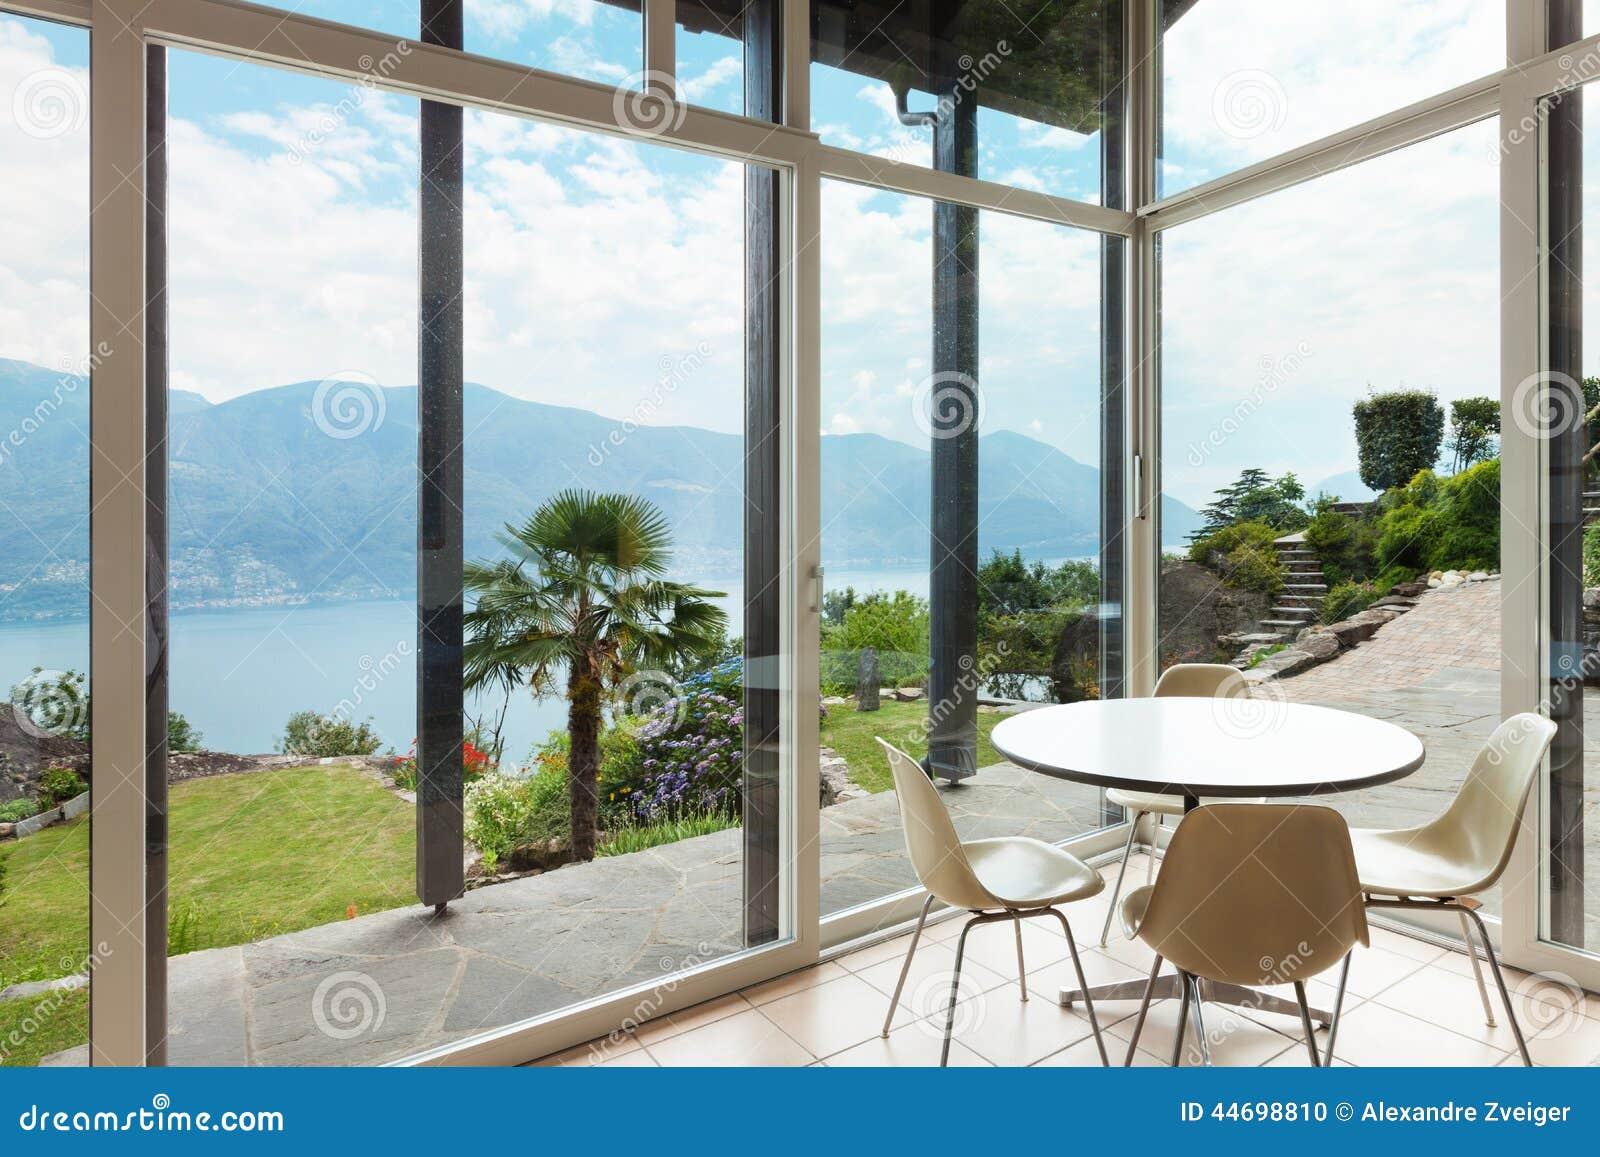 modern architecture interior veranda stock photo image. Black Bedroom Furniture Sets. Home Design Ideas